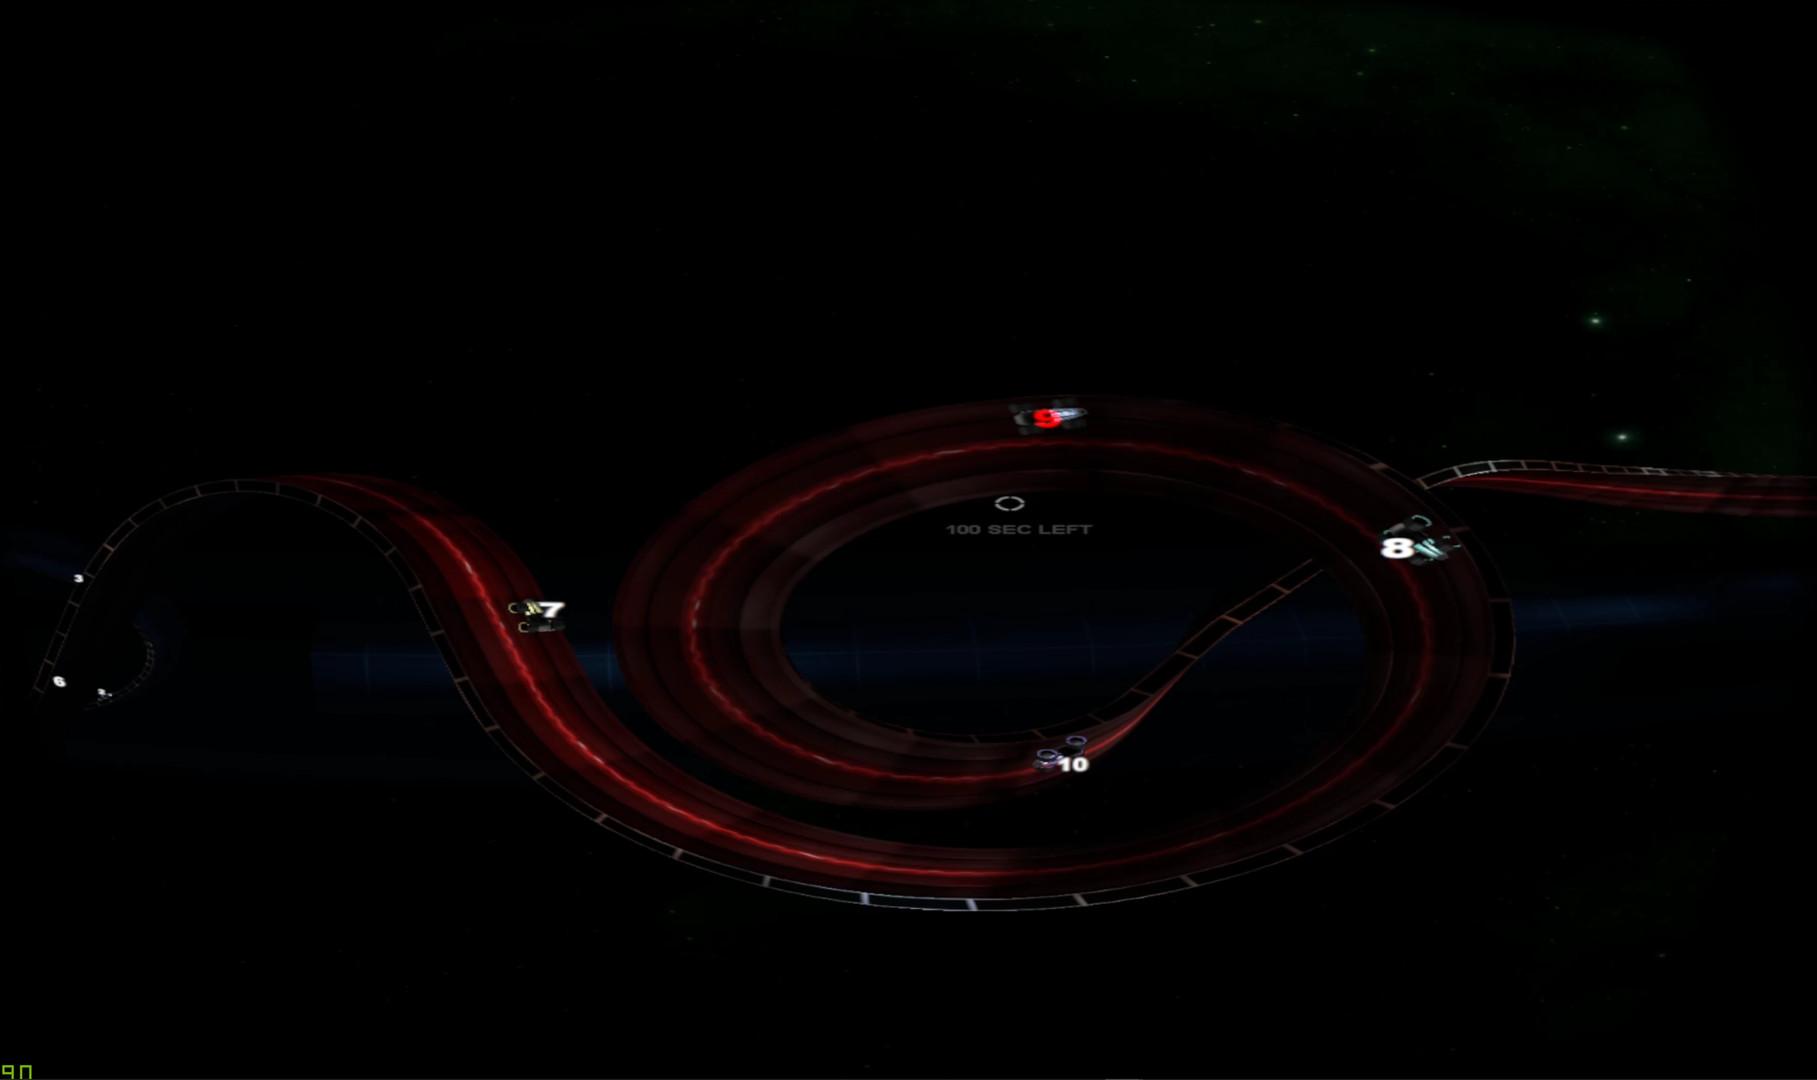 ORBTRAIN - Slot Racing (PC VR)